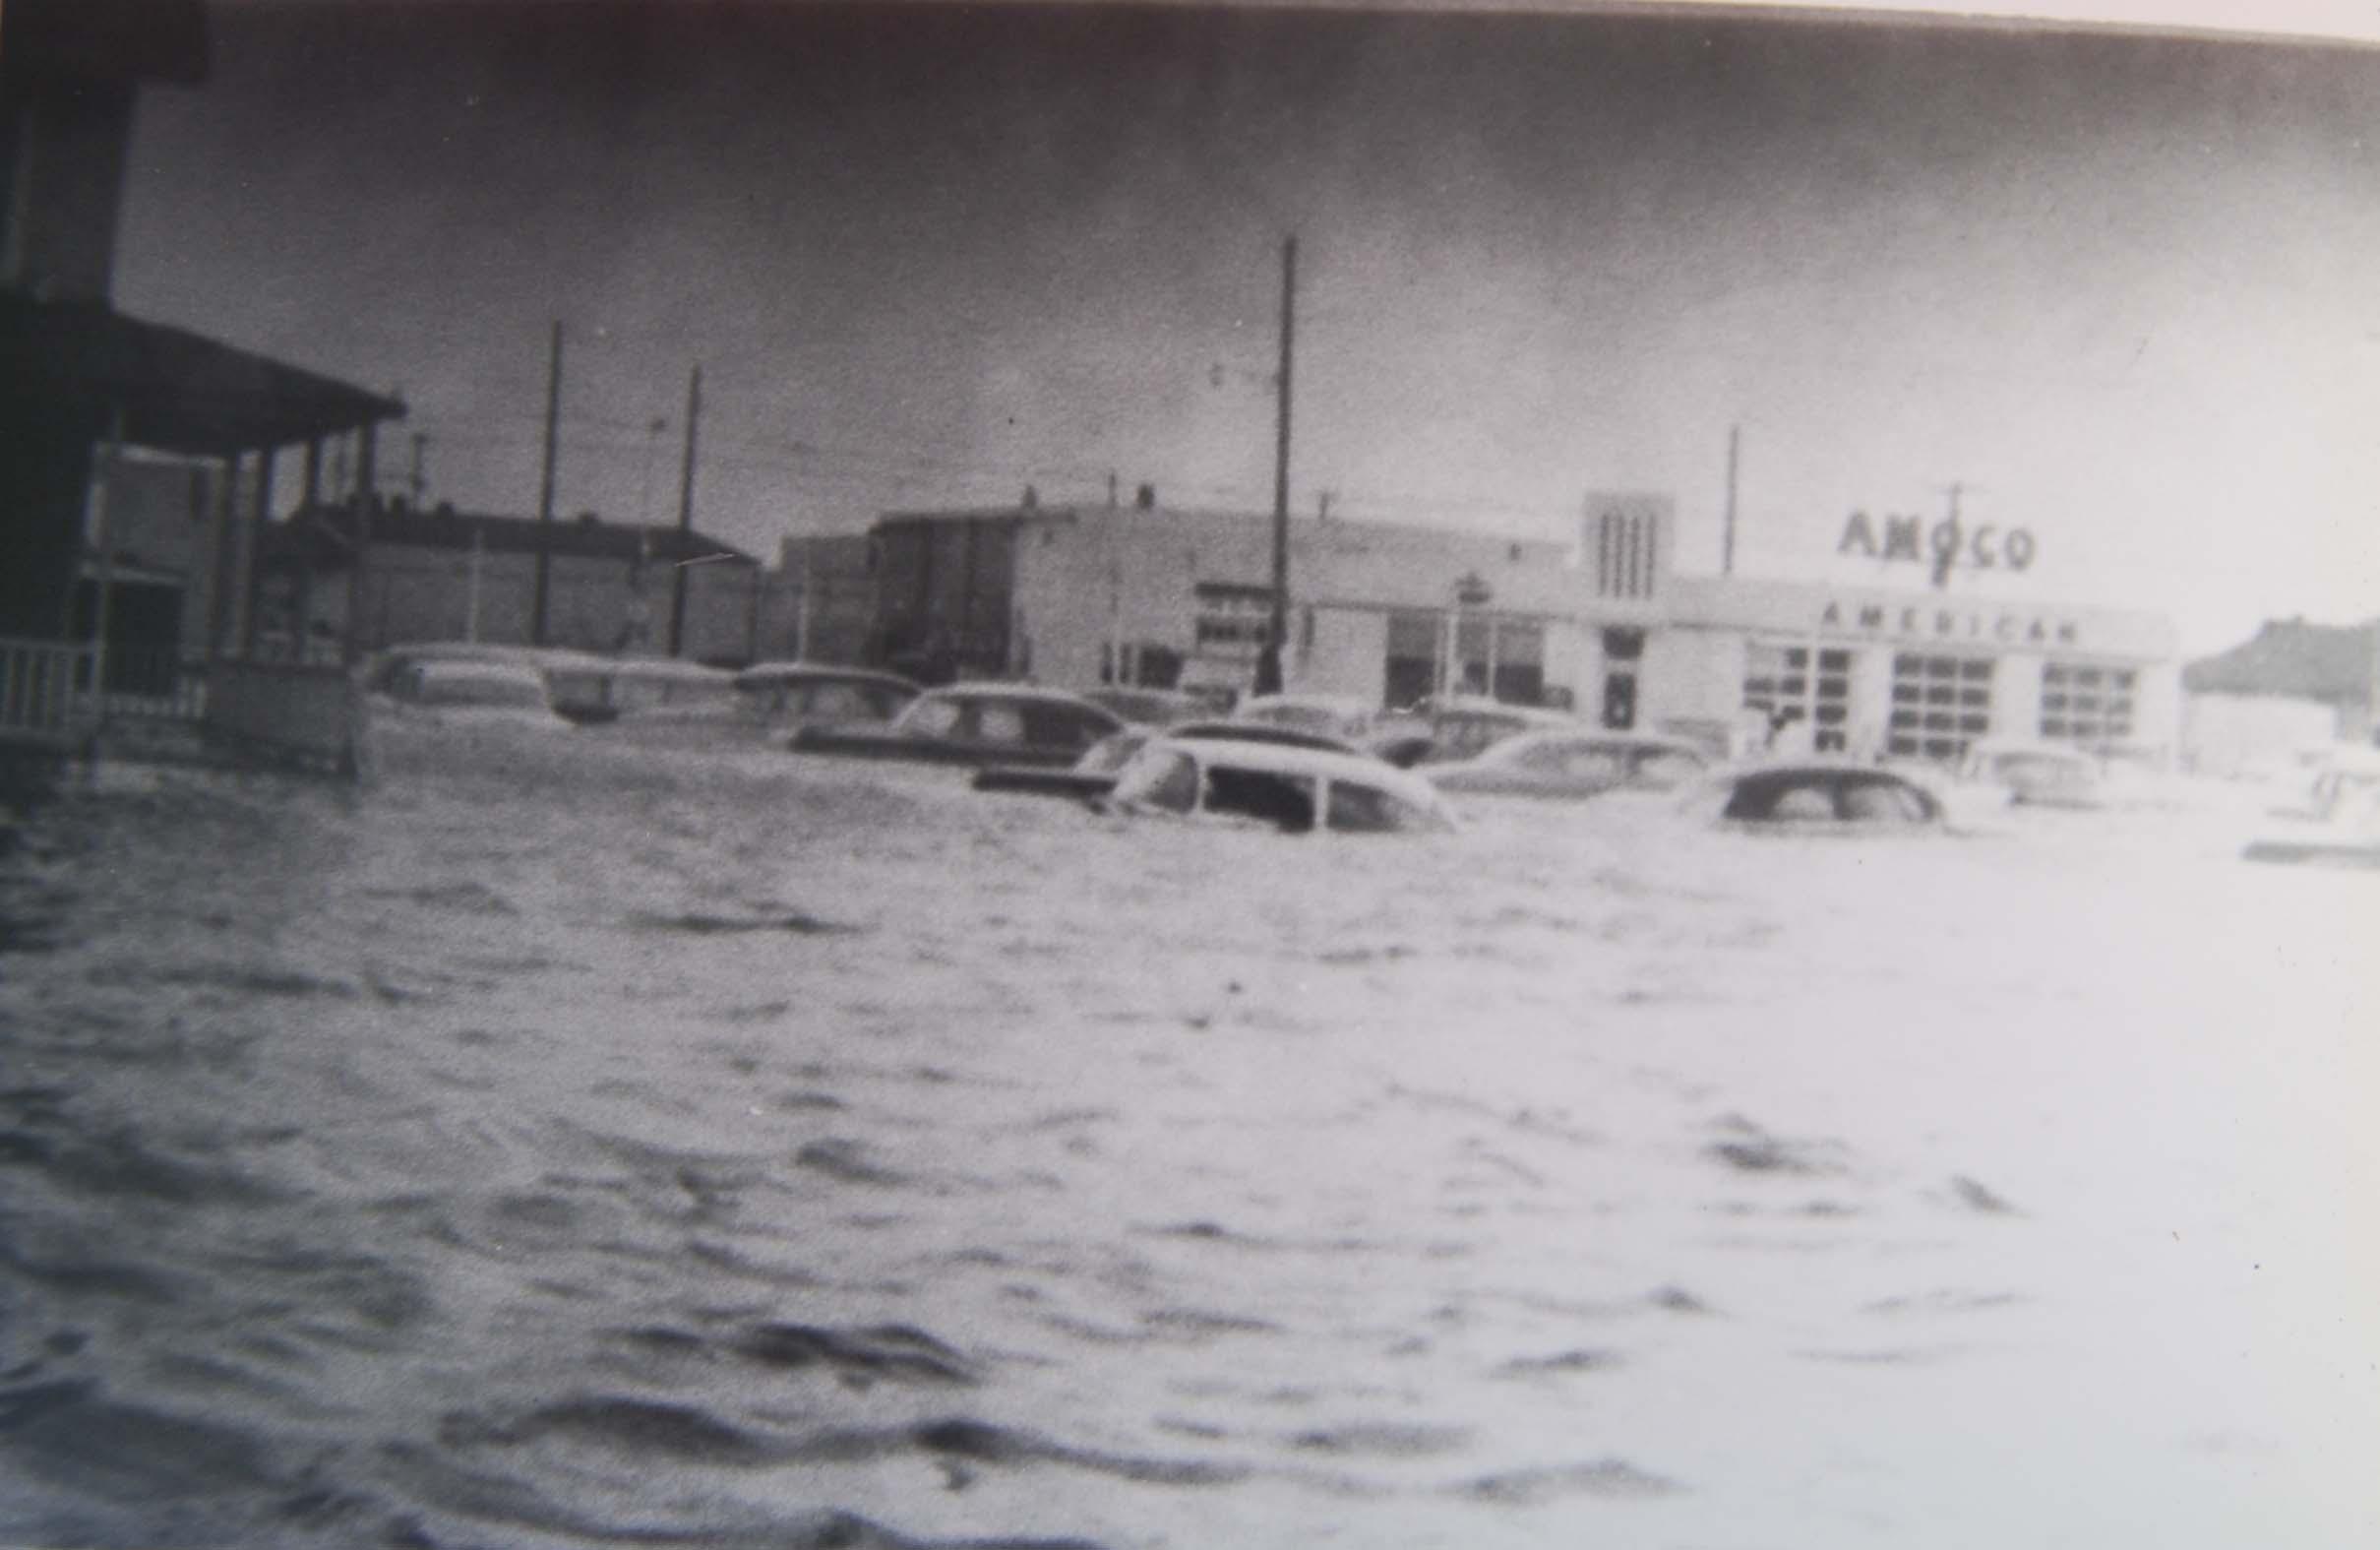 Cars Under Water 62 Flood